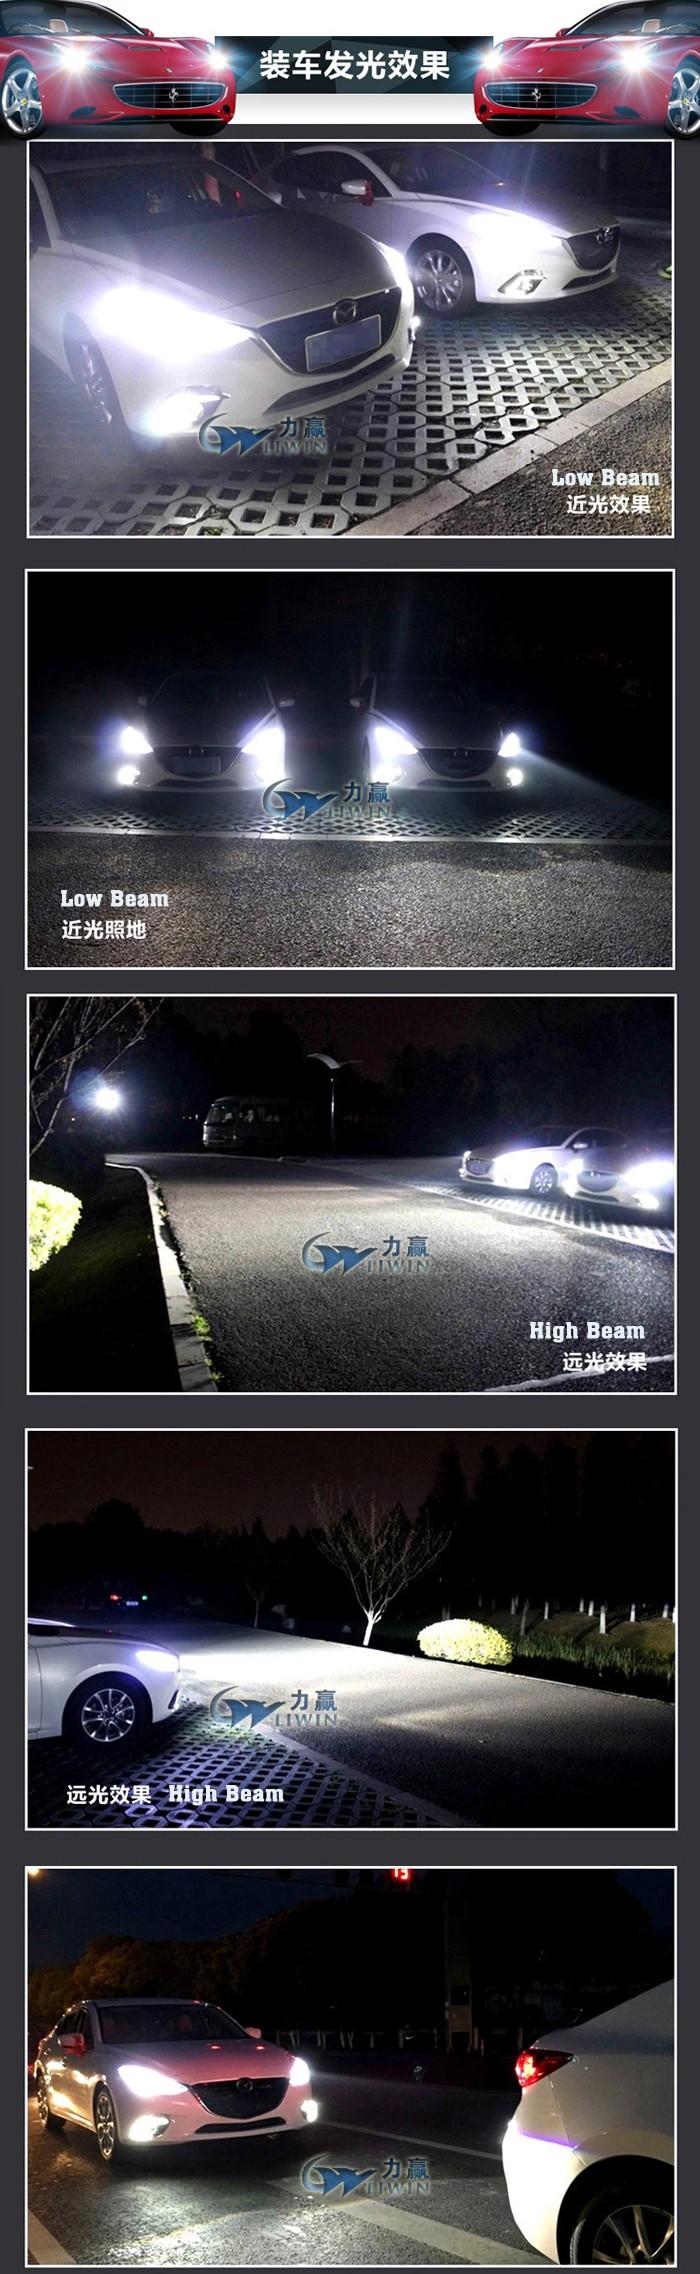 LH57 led headlight-2.jpg